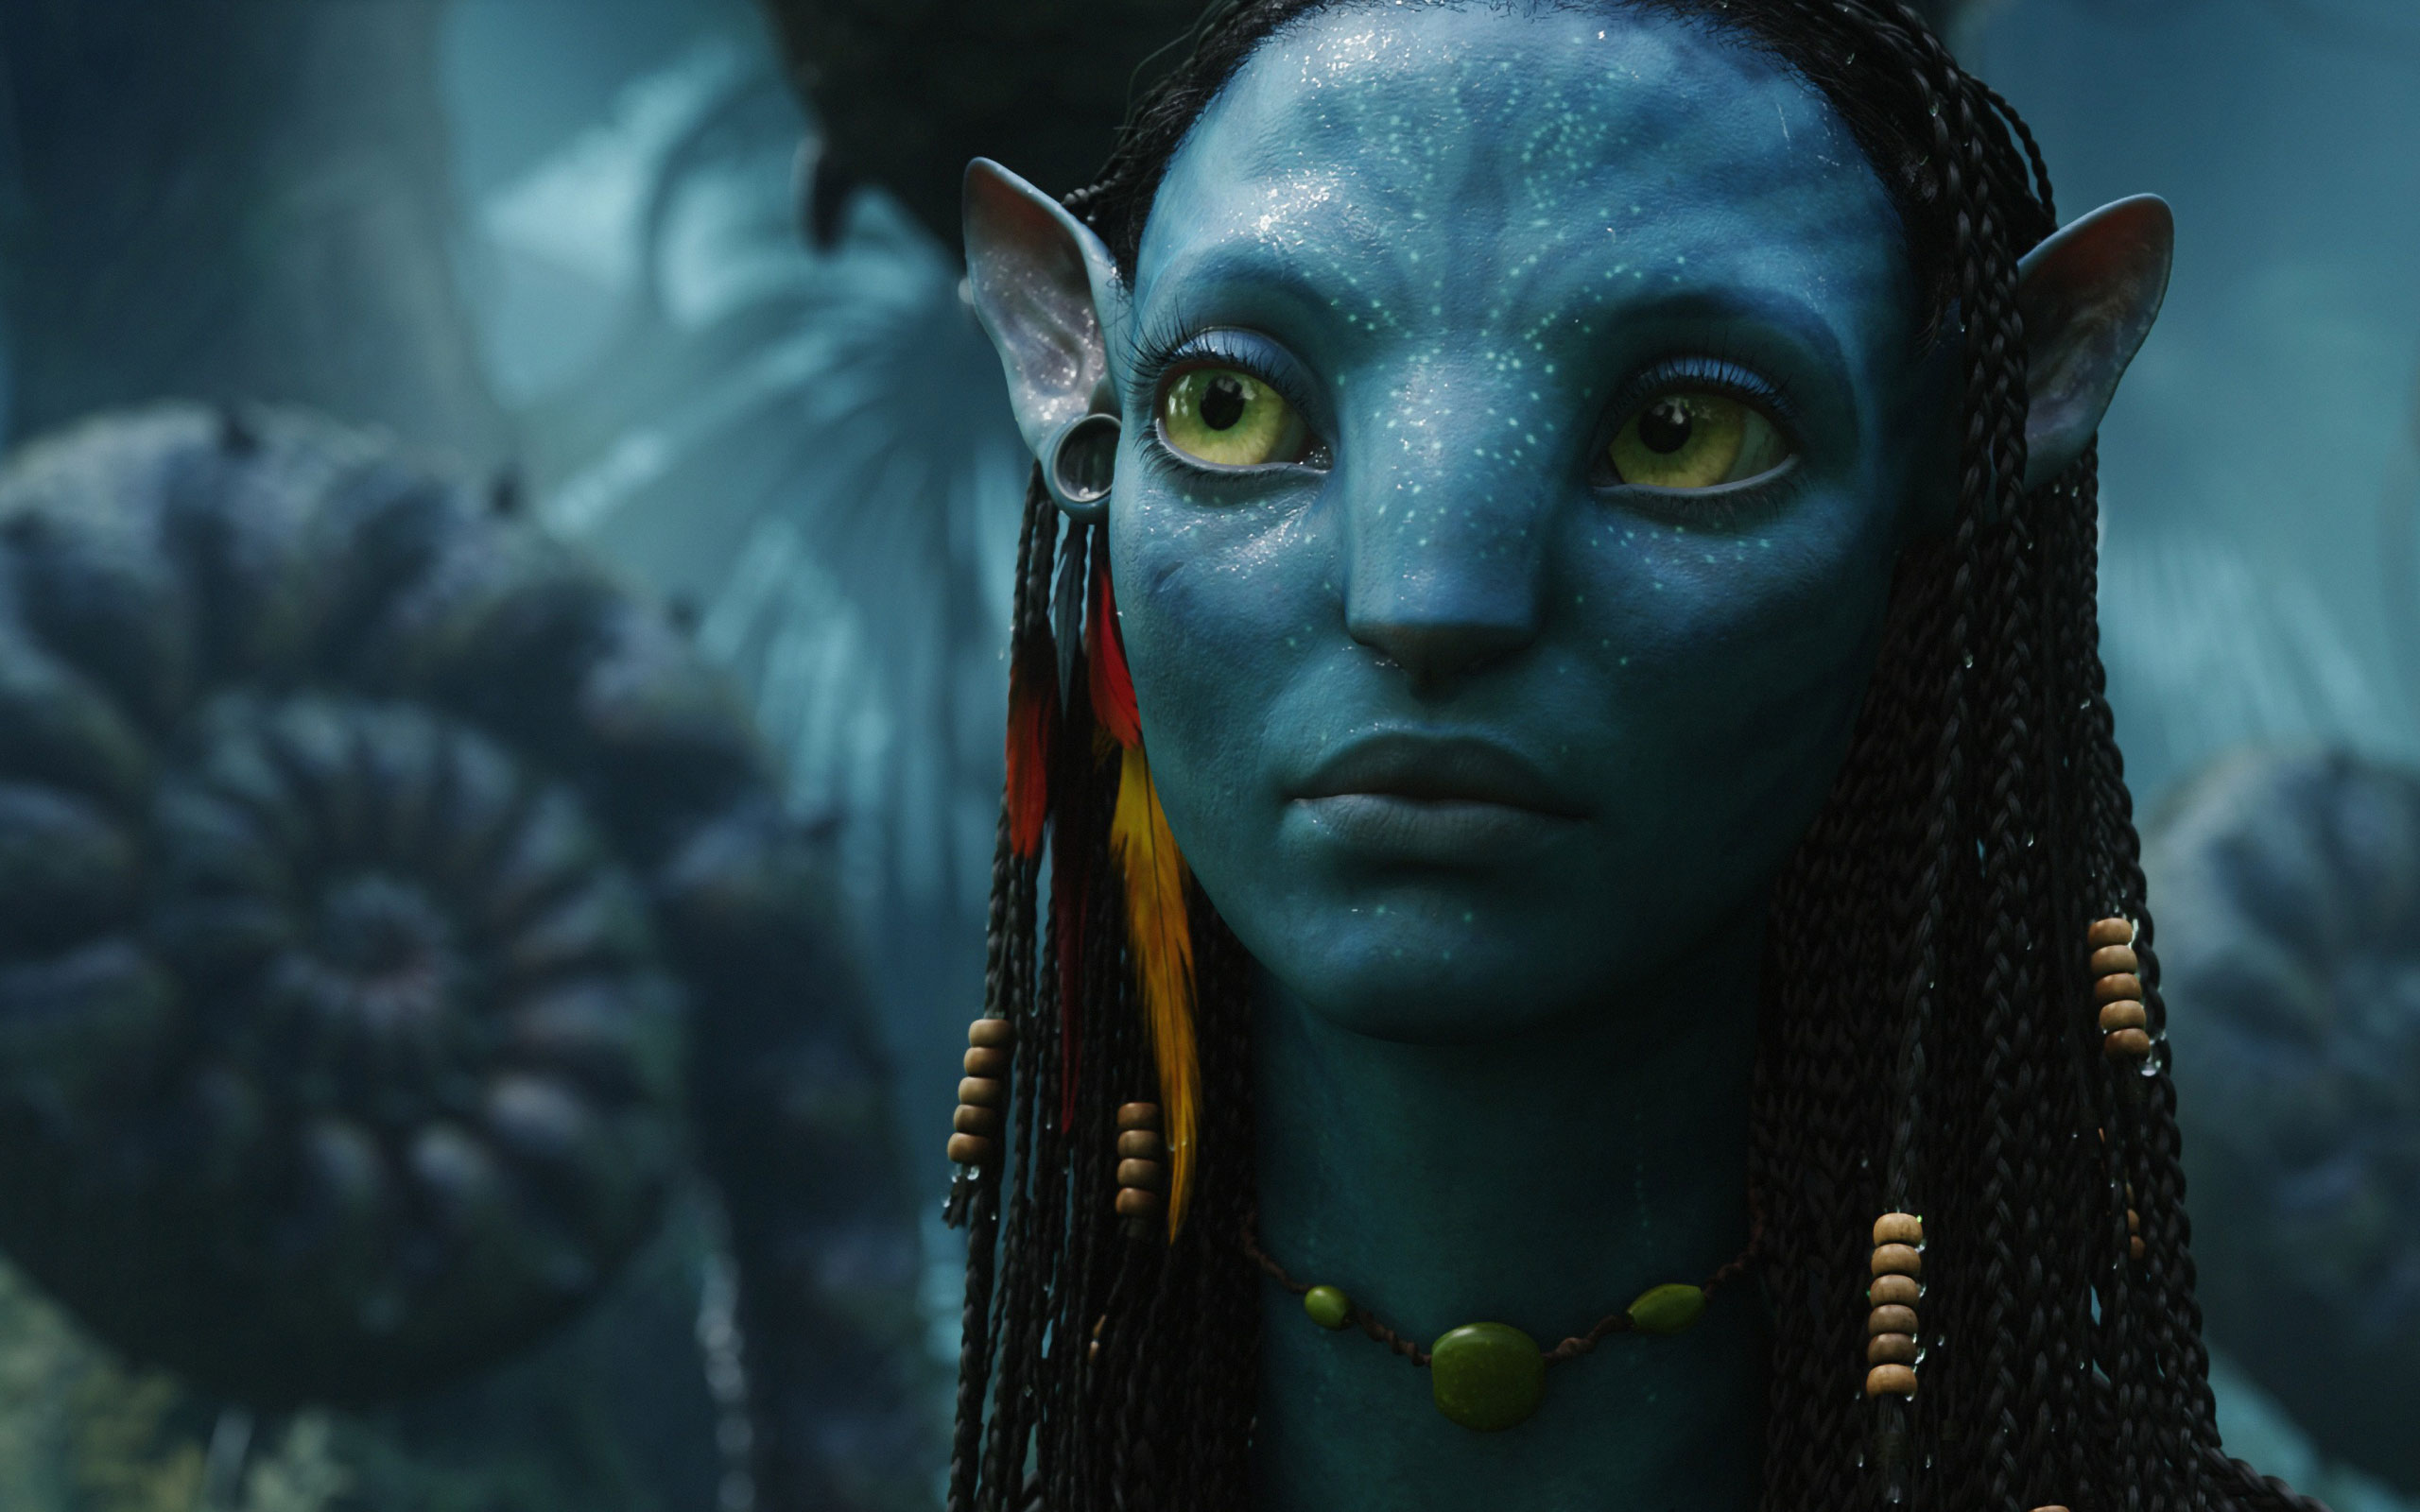 HD Wallpapers Neytiri Female in Avatar